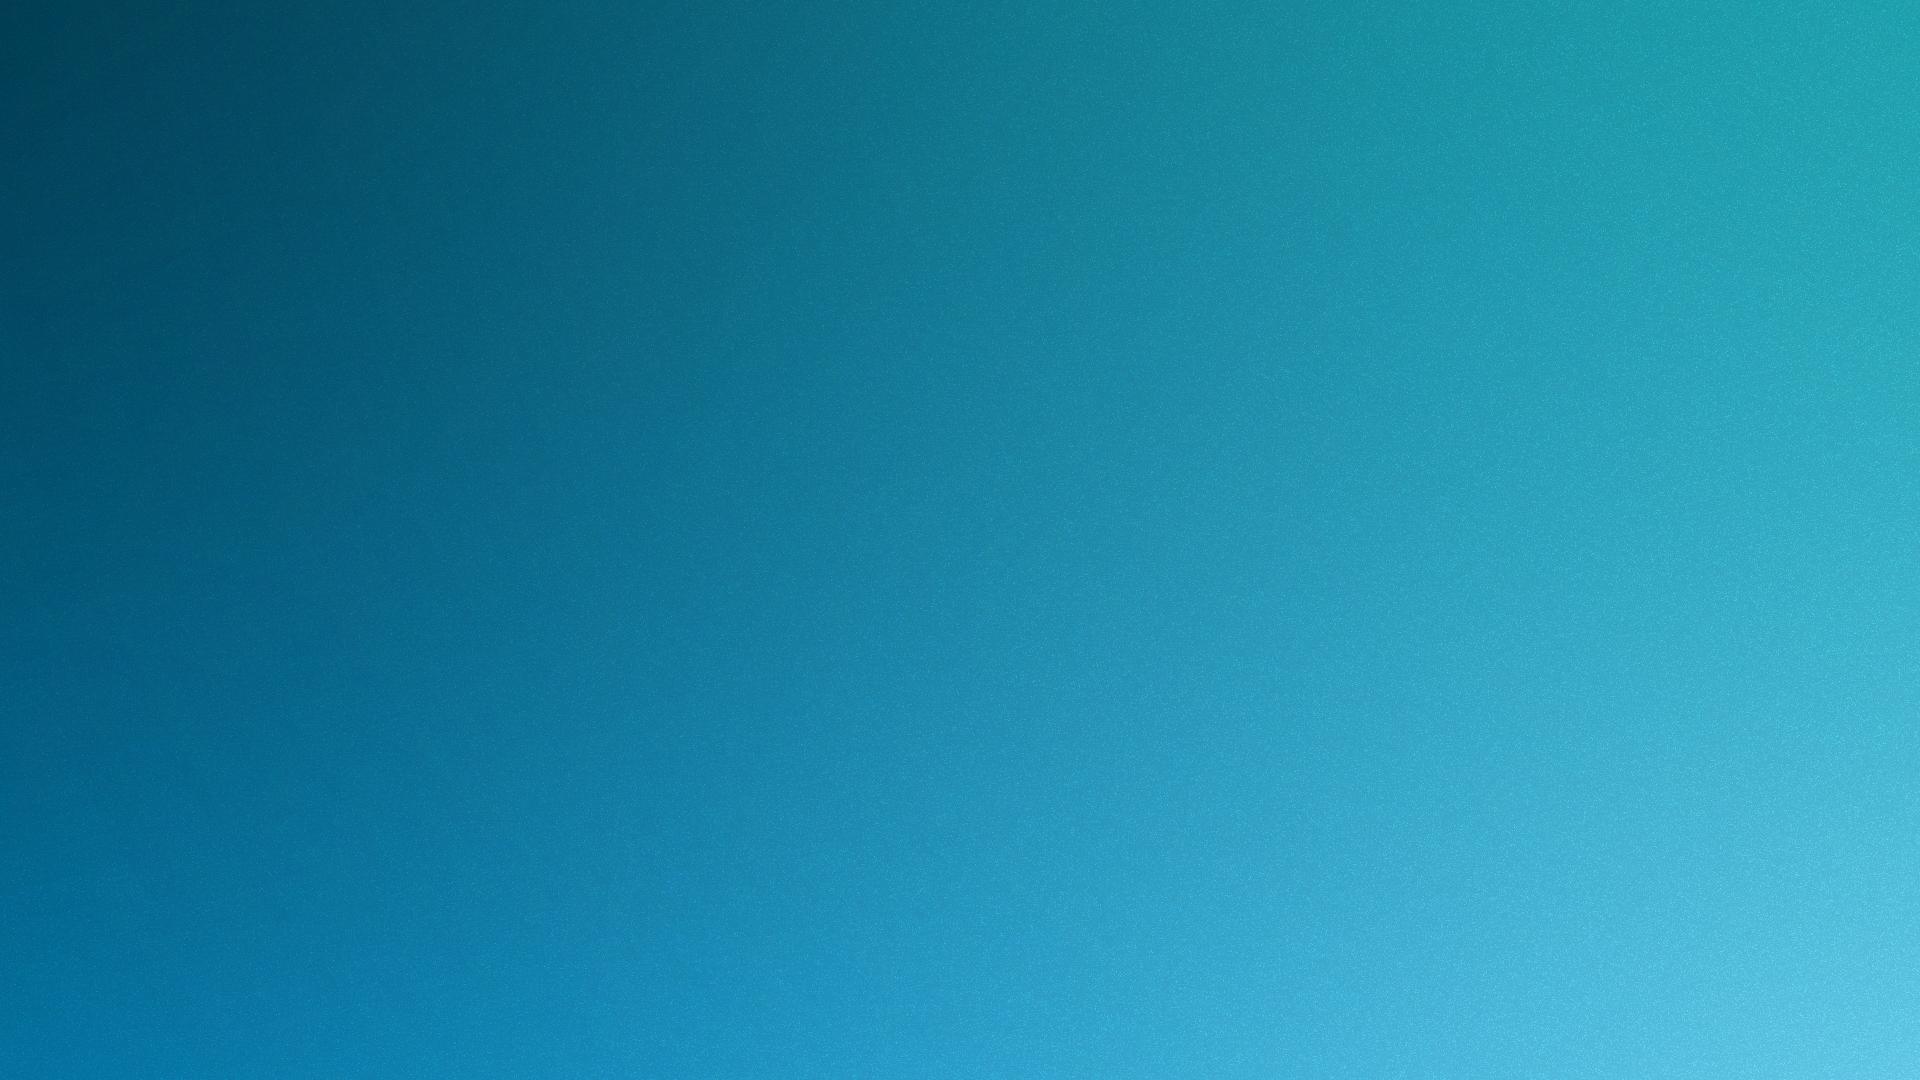 minimalist wallpaper blue images